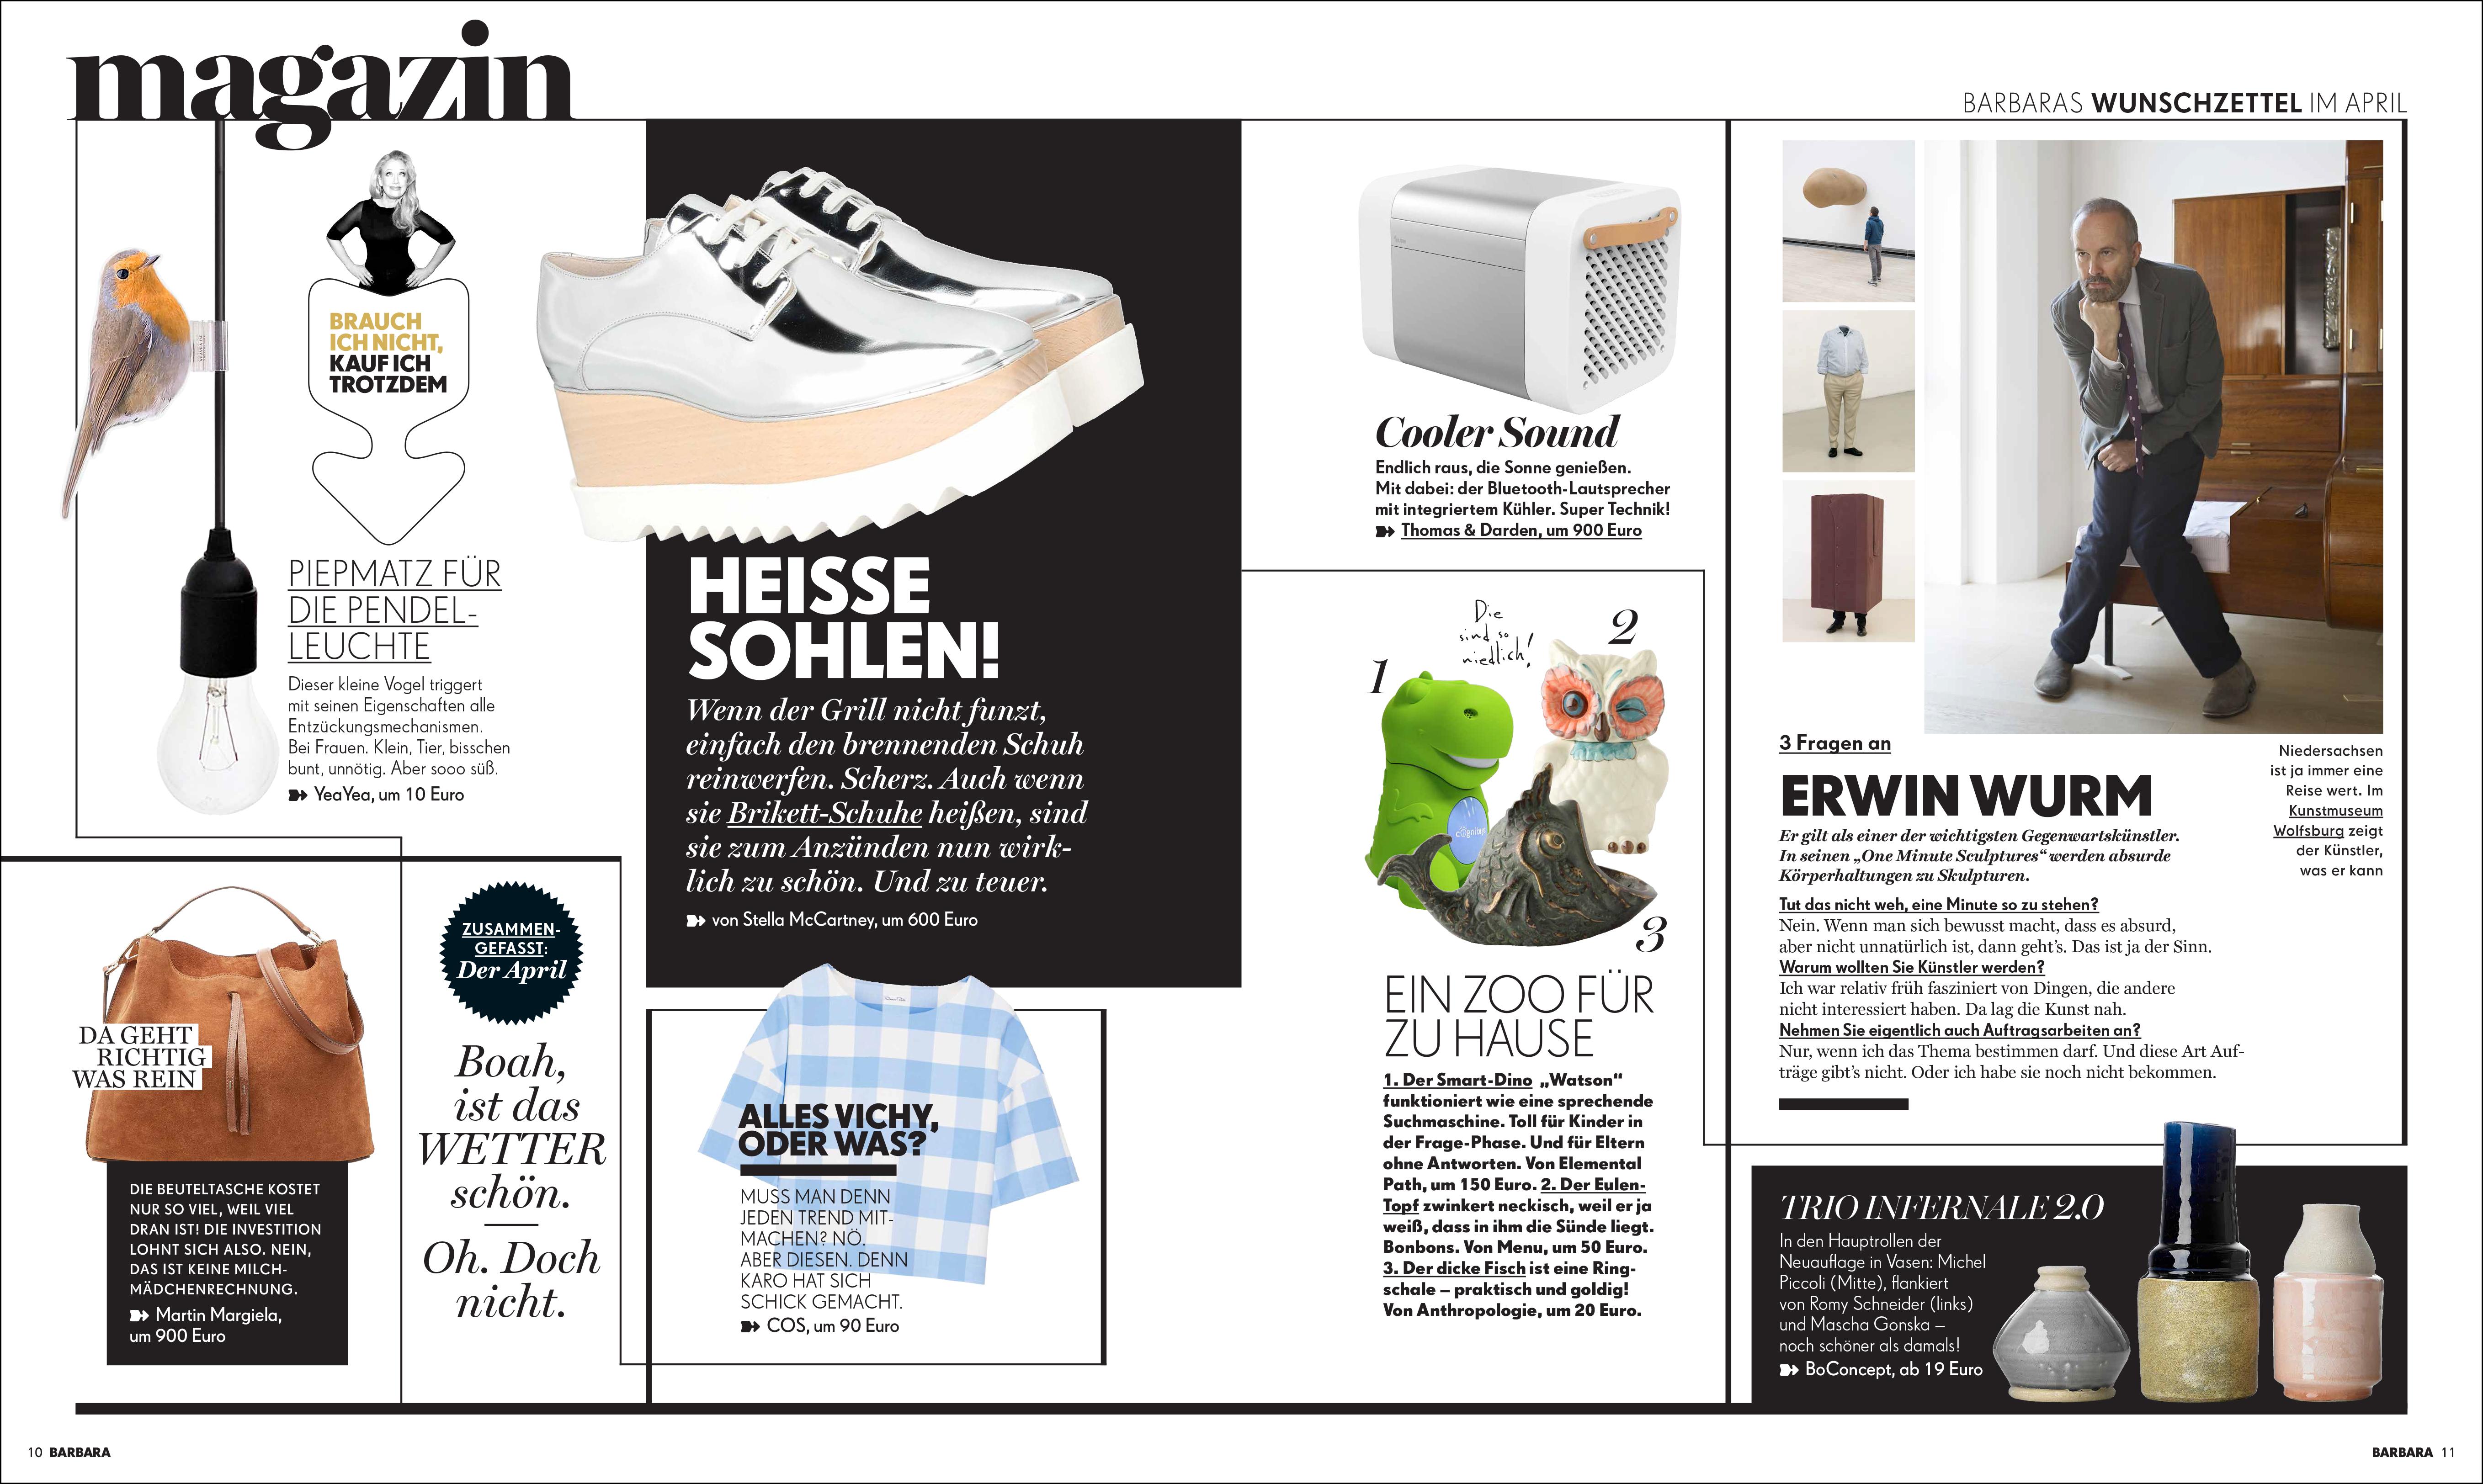 010_Magazin-1